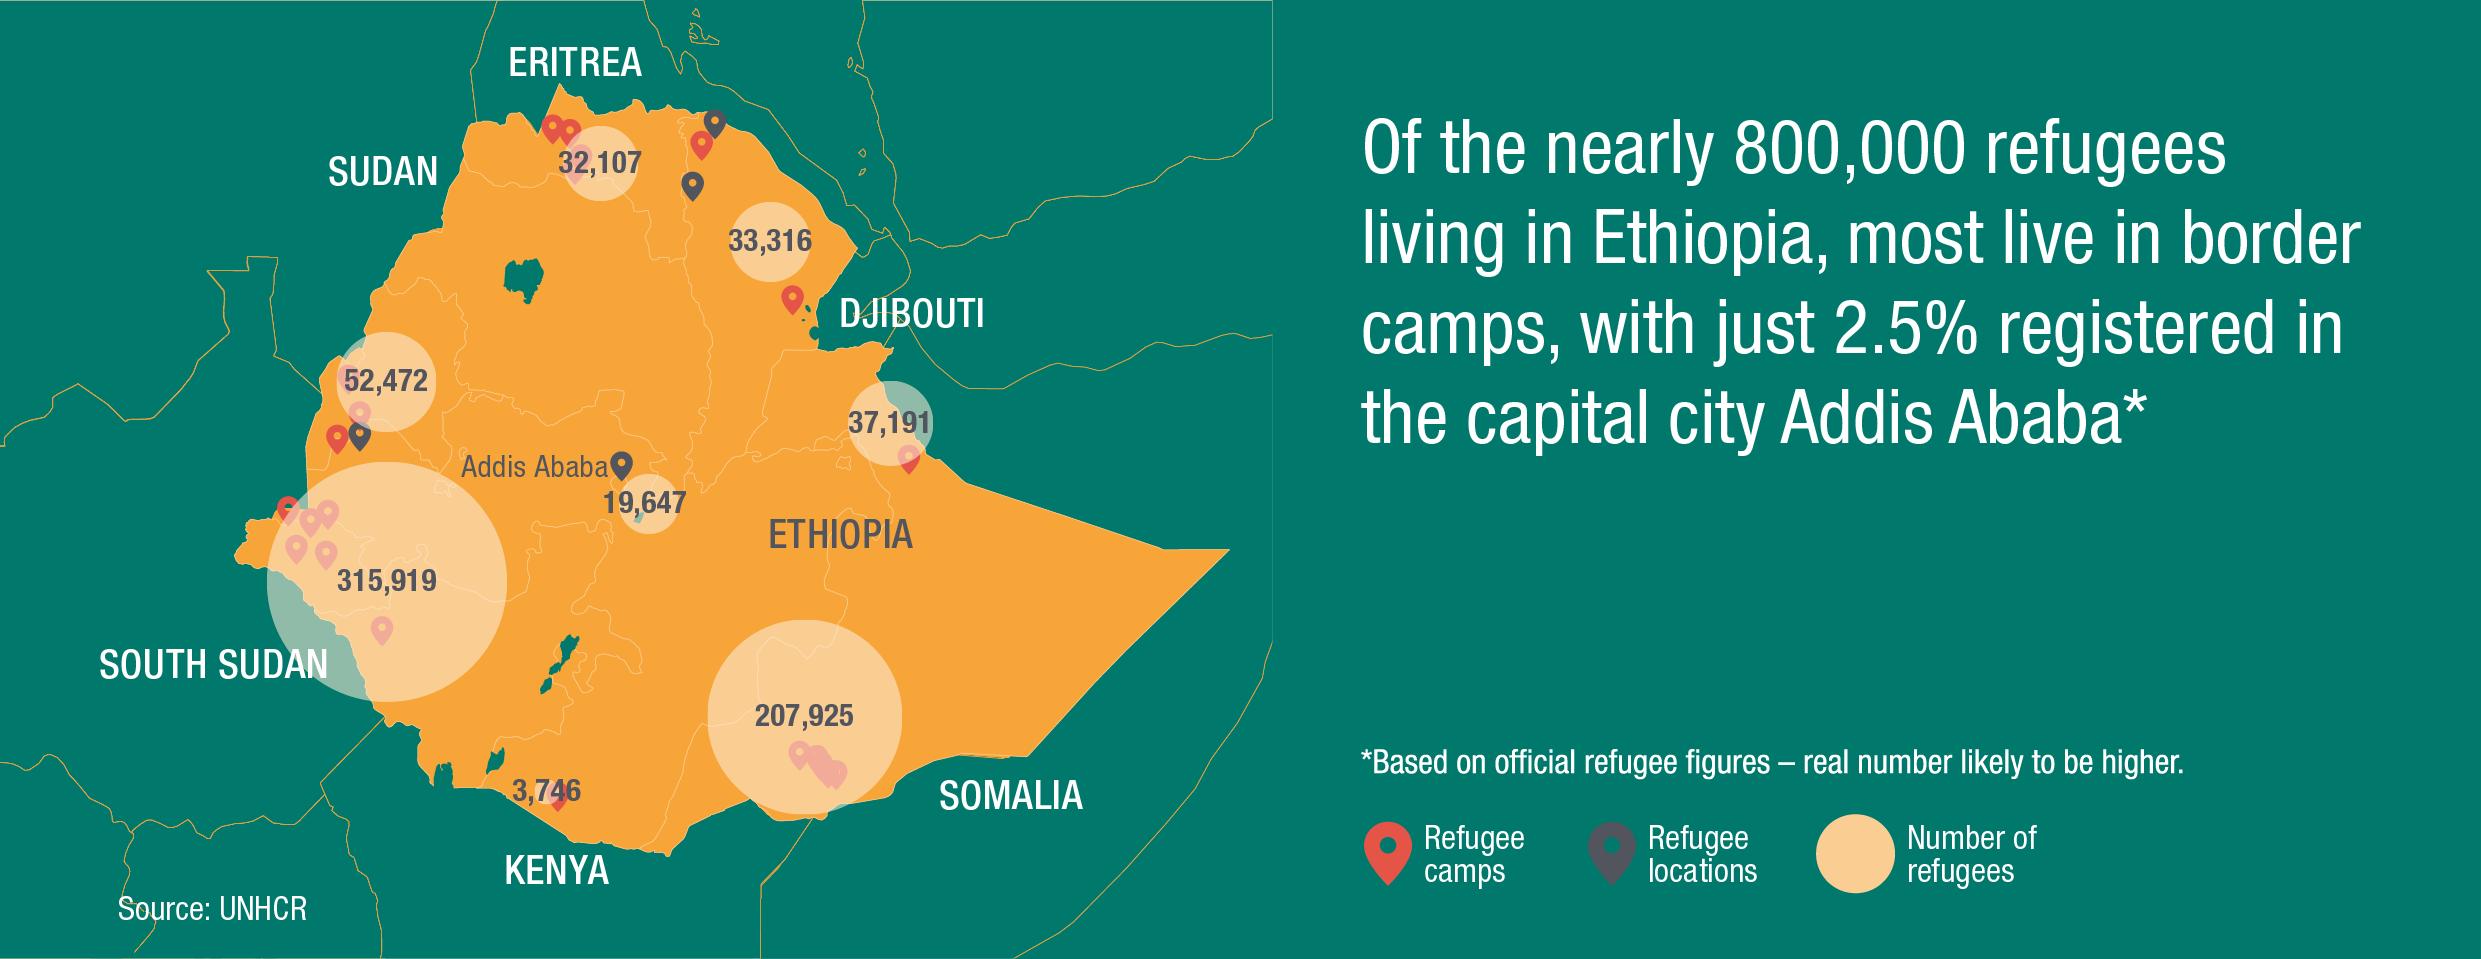 Source: UNHCR, 2016